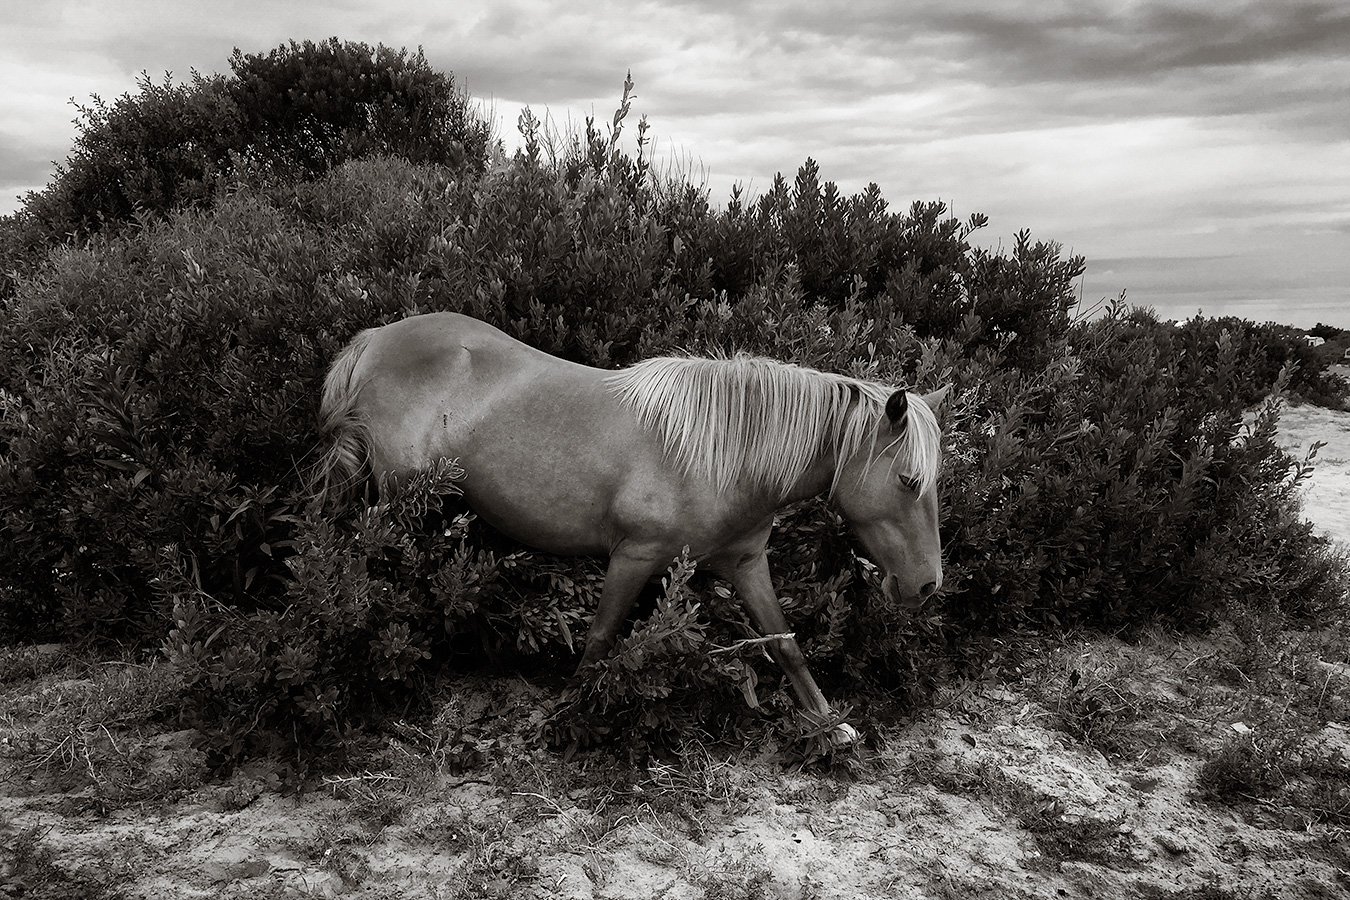 Horse in the Bush